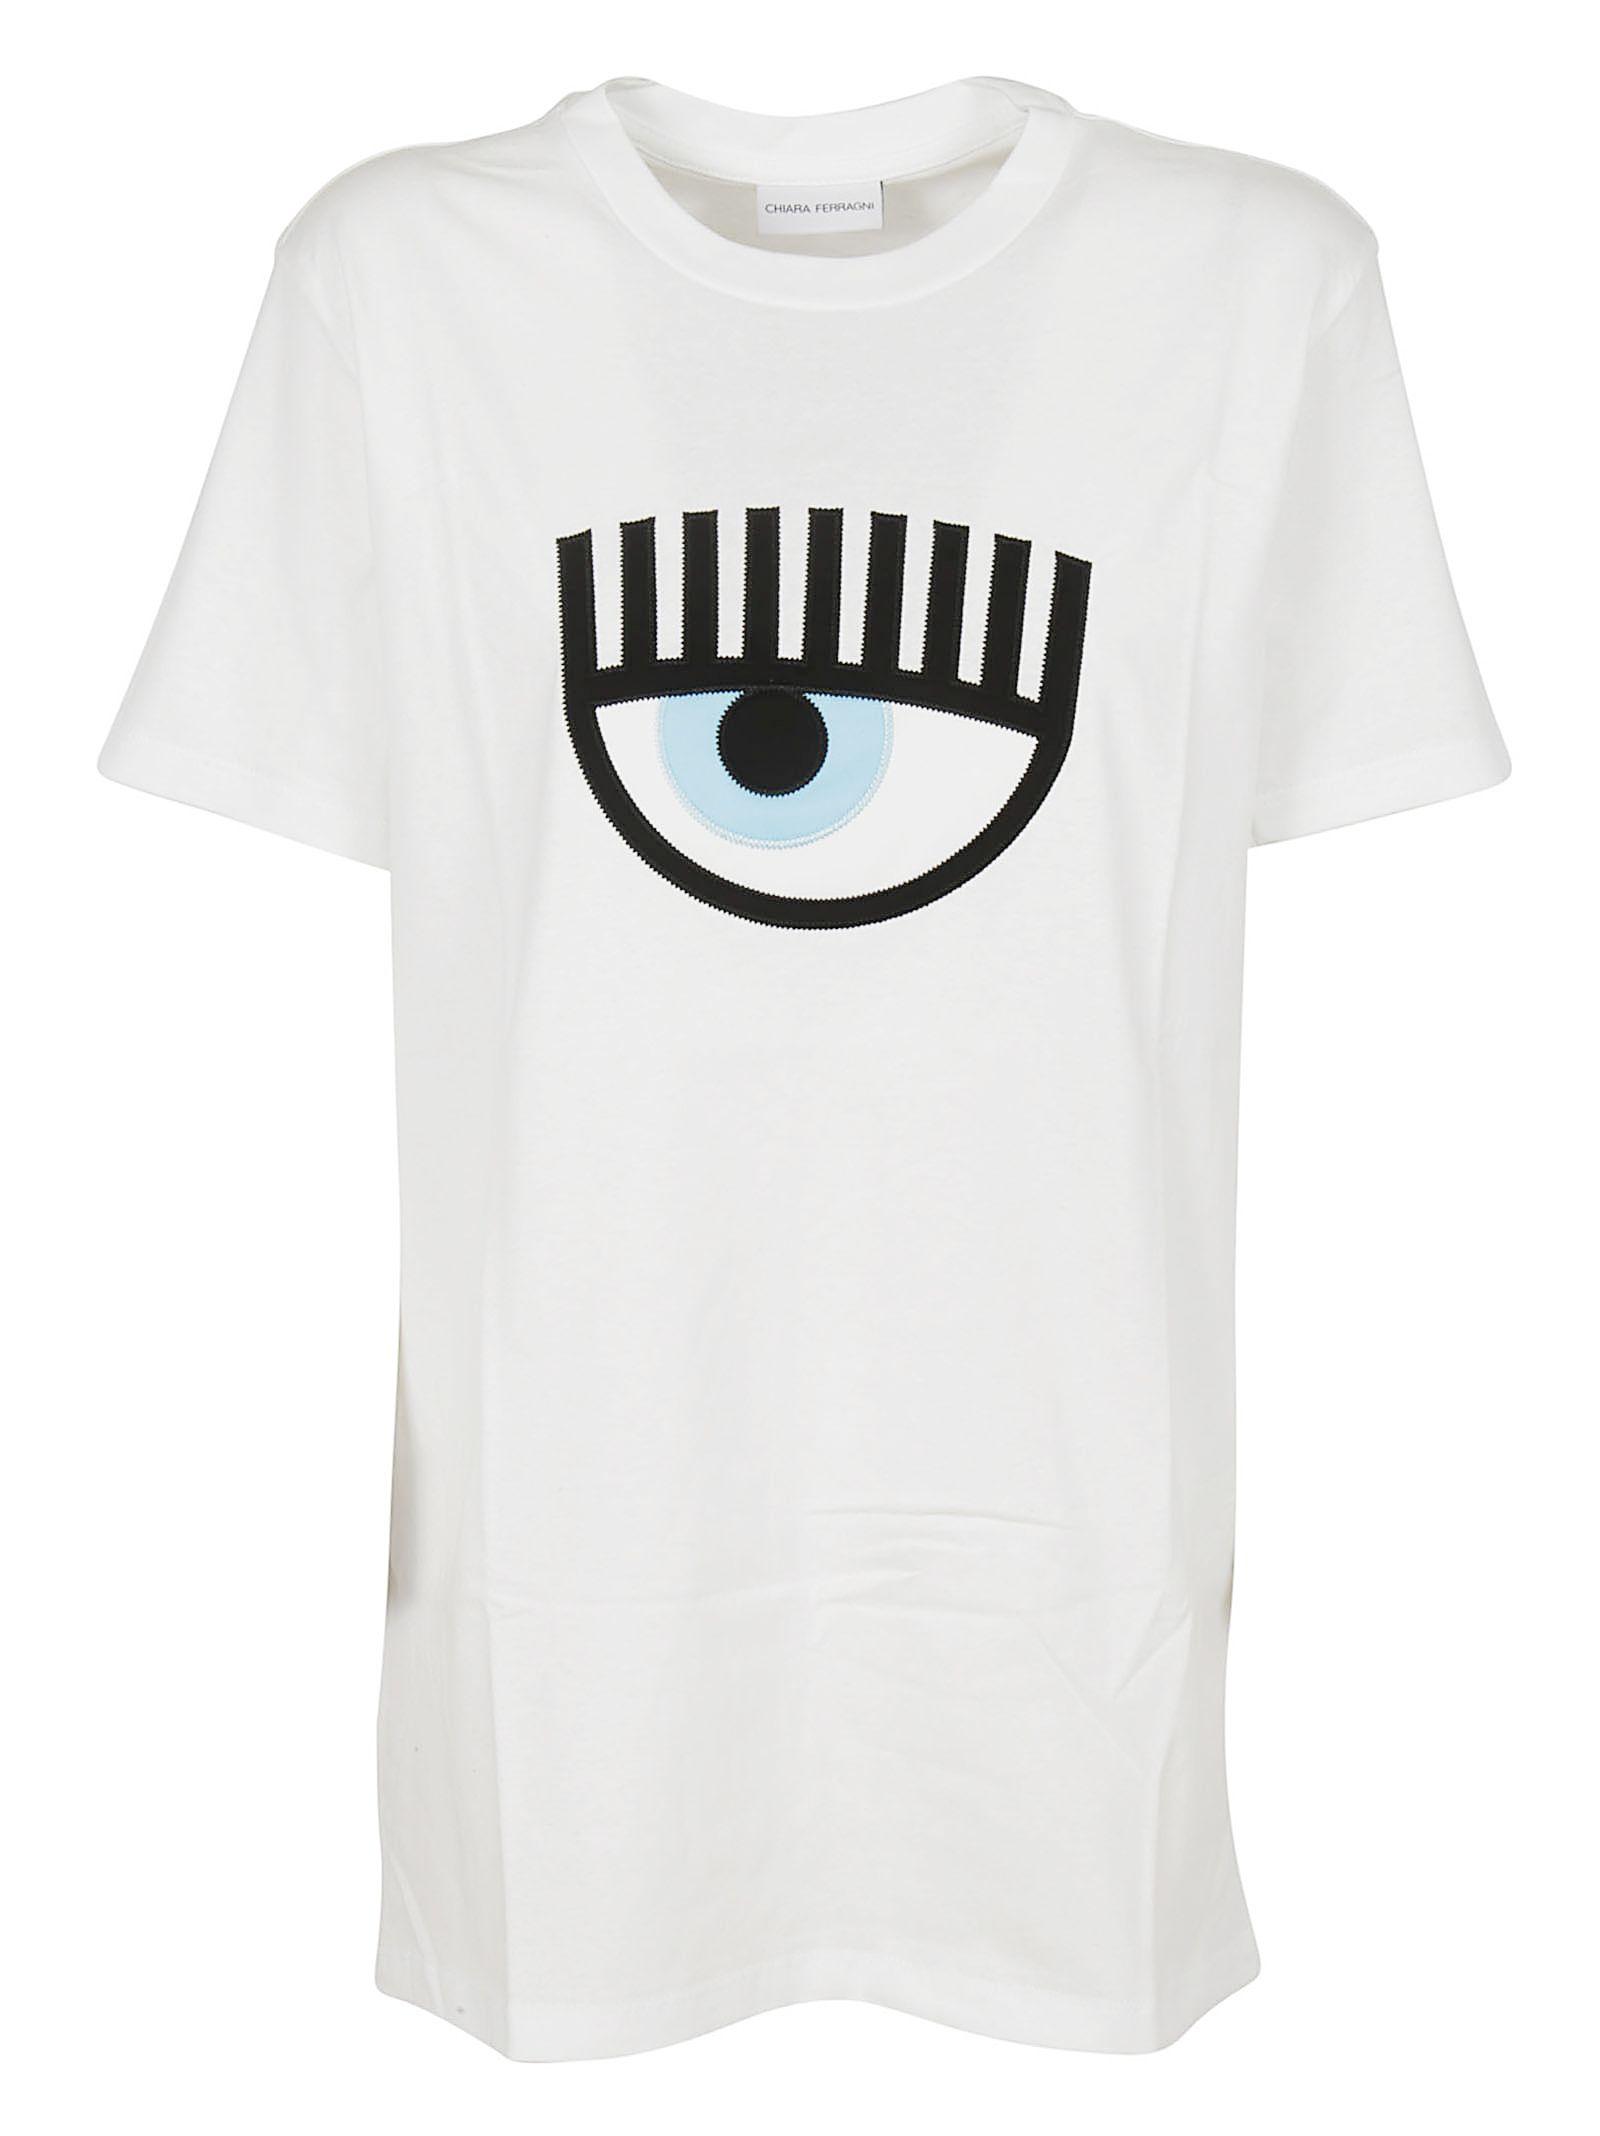 Chiara Ferragni Chiara Ferragni Eye T Shirt